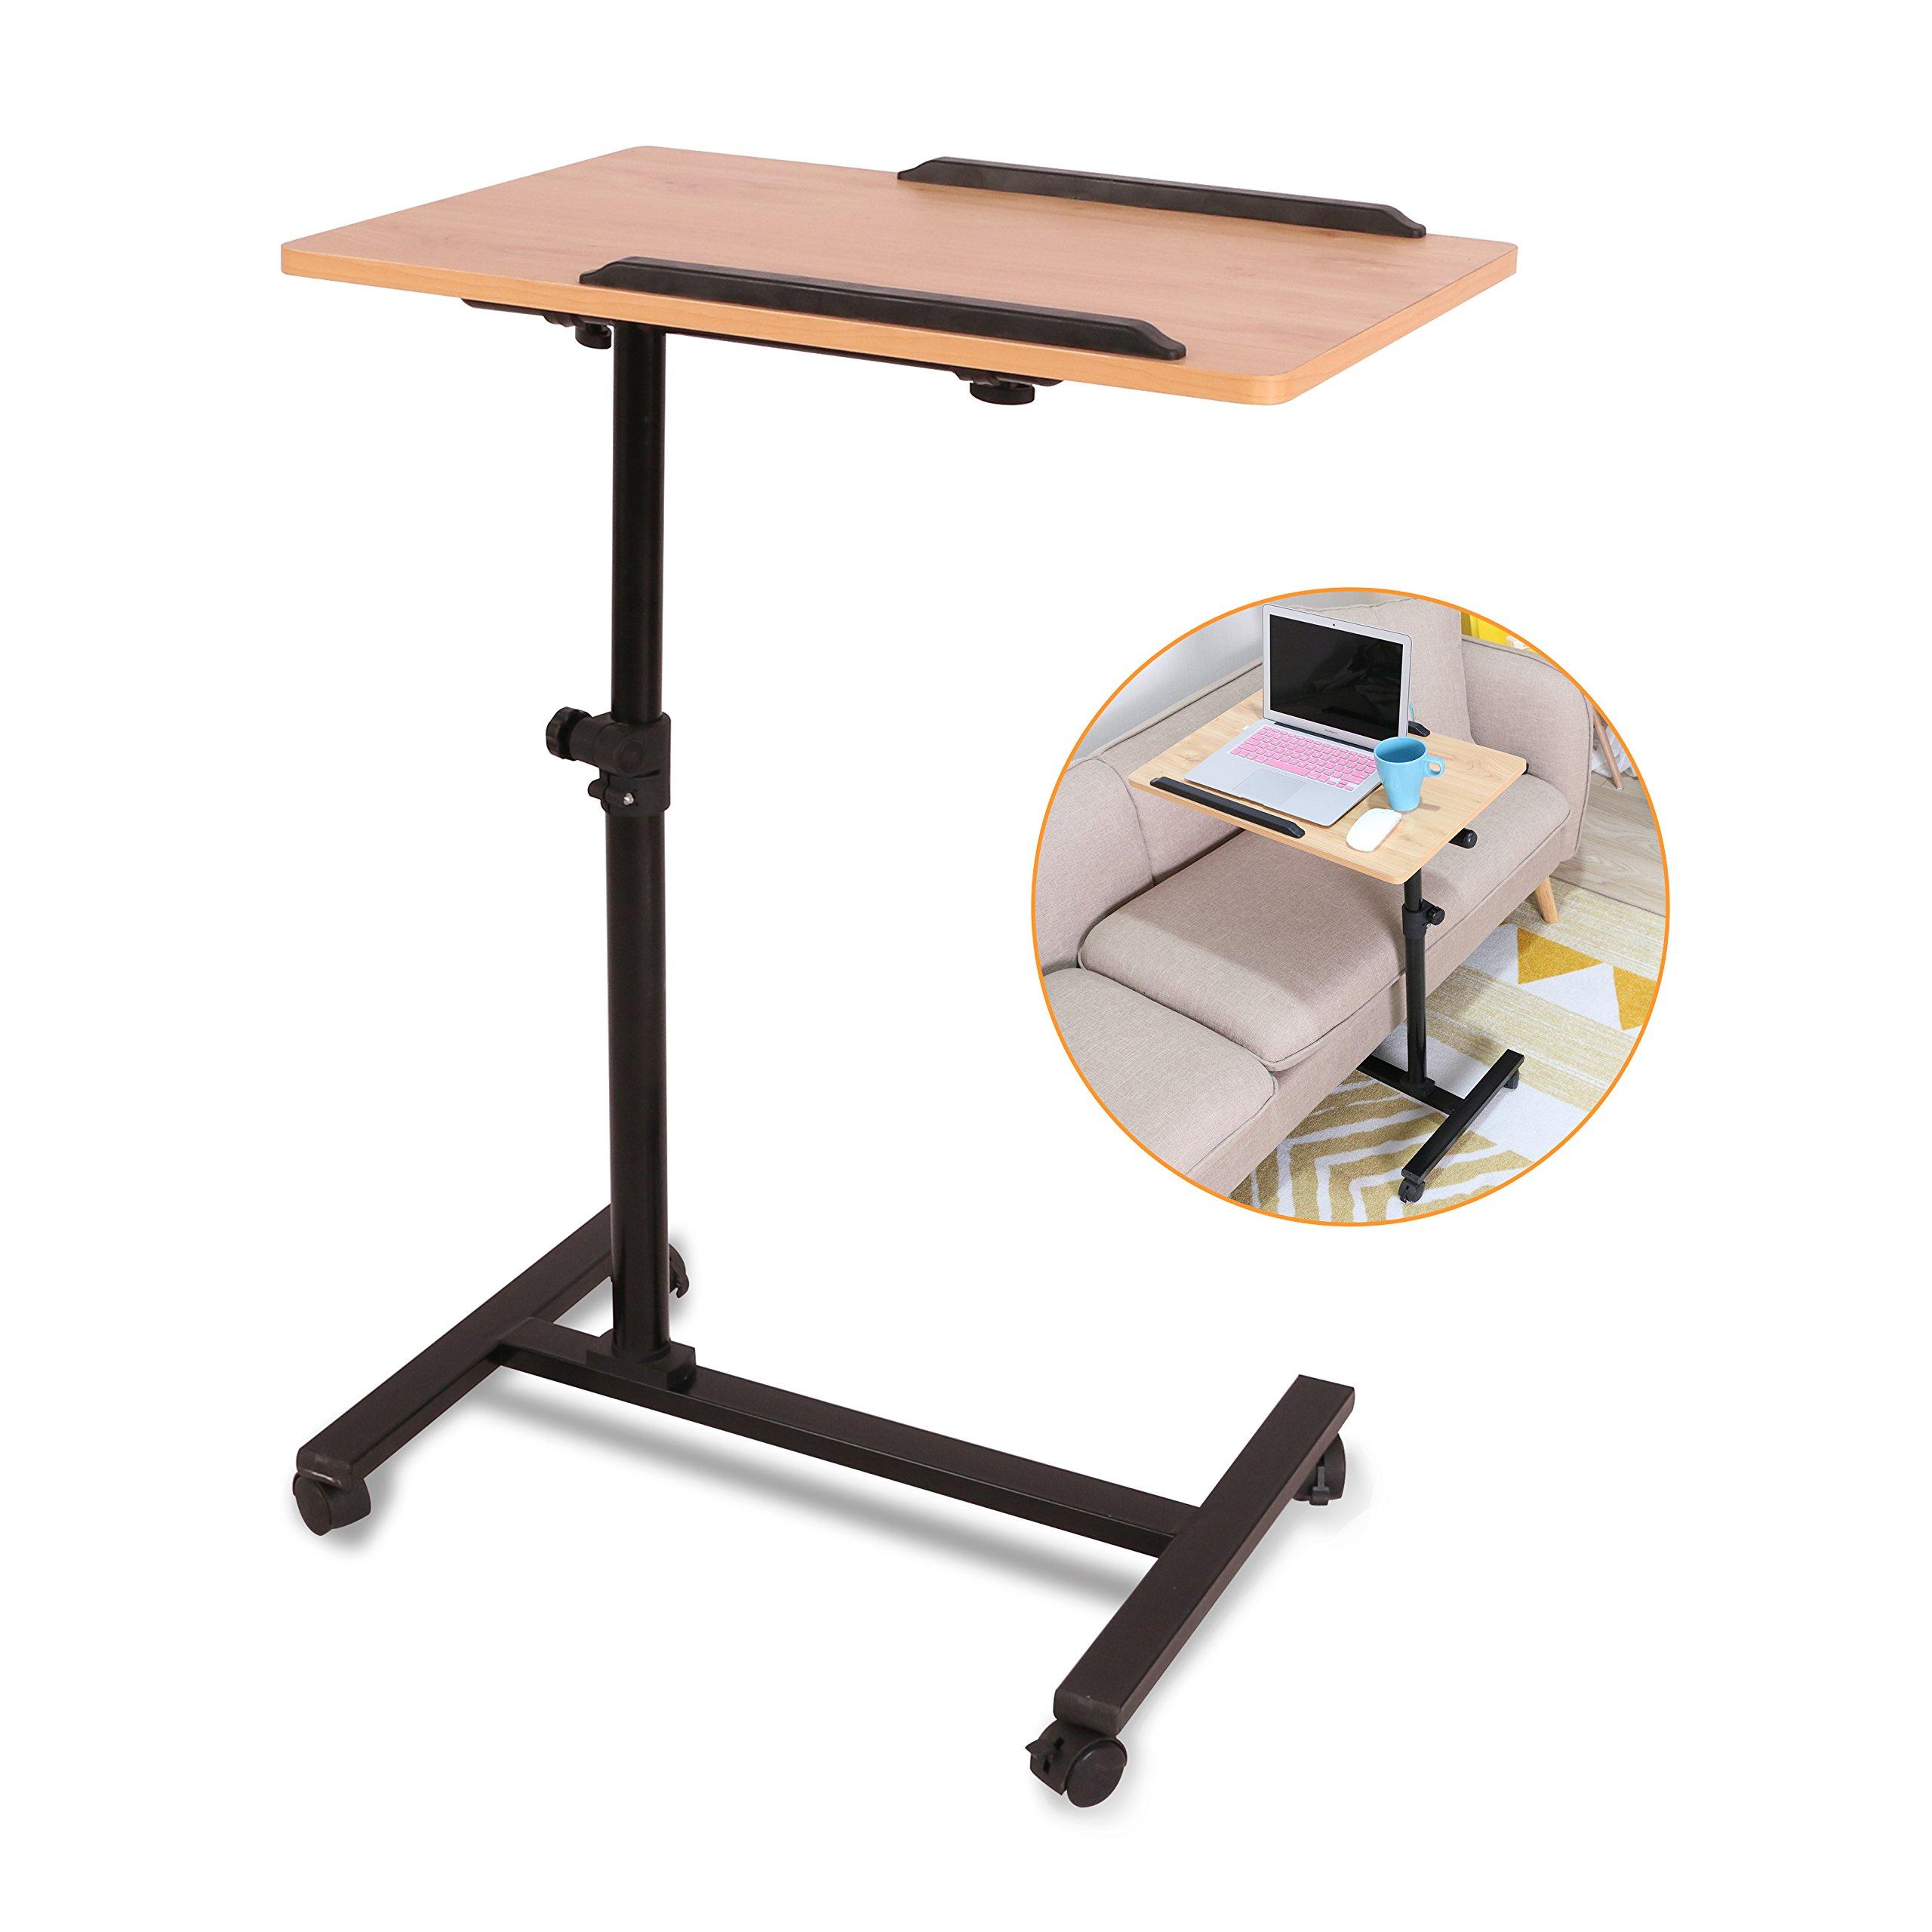 Ebuynar Adjustable Overbed Table Laptop Cart with Wheels (Single Side,Light Brown)